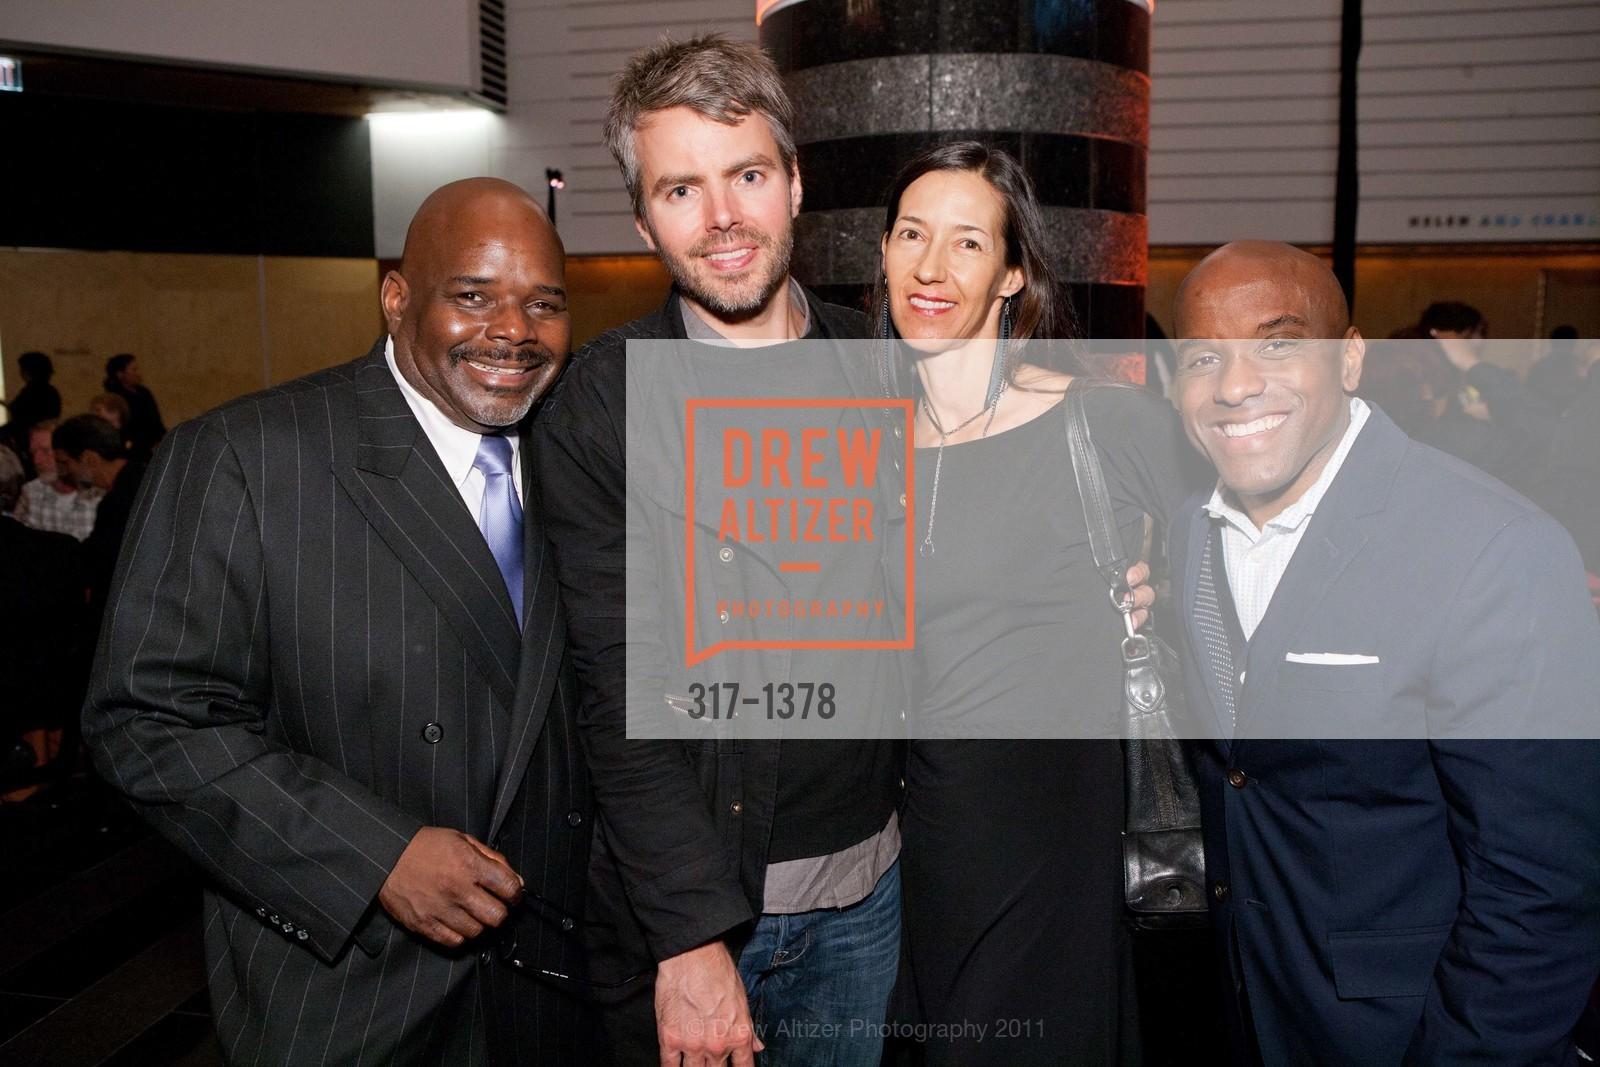 Oliver Glover, Tim Paschke, Marilynne Morsehead, Marcus Keller, Photo #317-1378